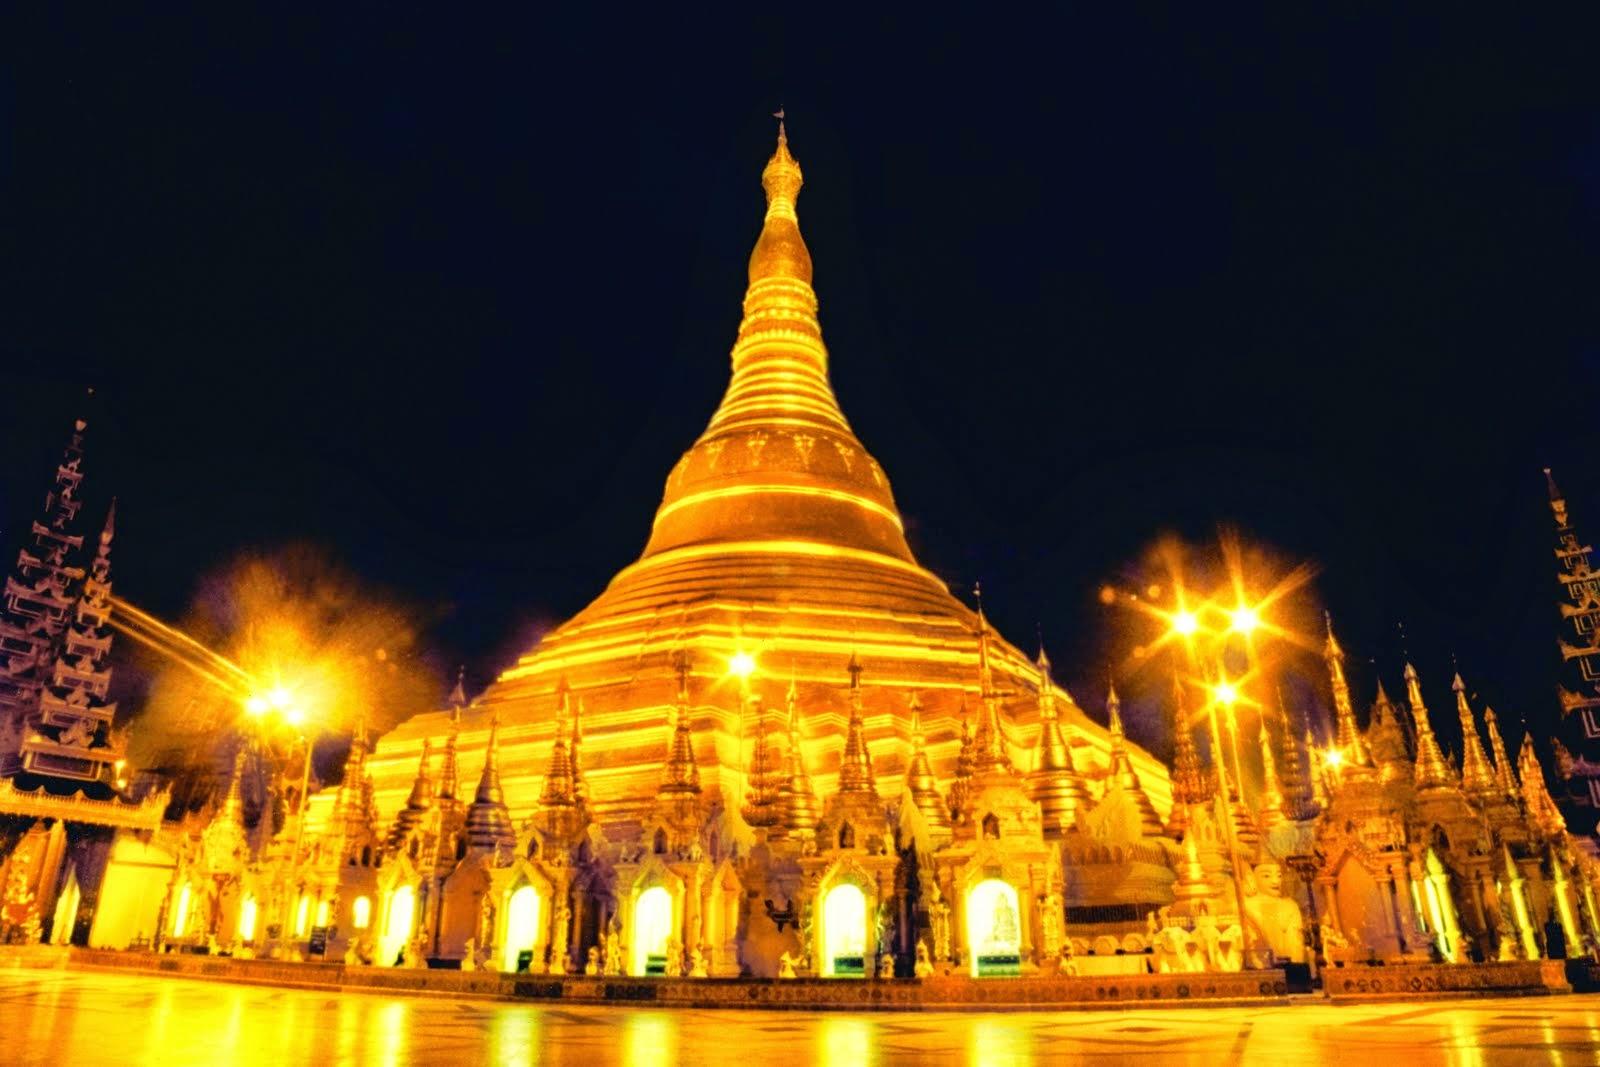 Goresan Pena Destinasi Wisata Wajib Kamu Kunjungi Berastagi Tinggi Pagoda